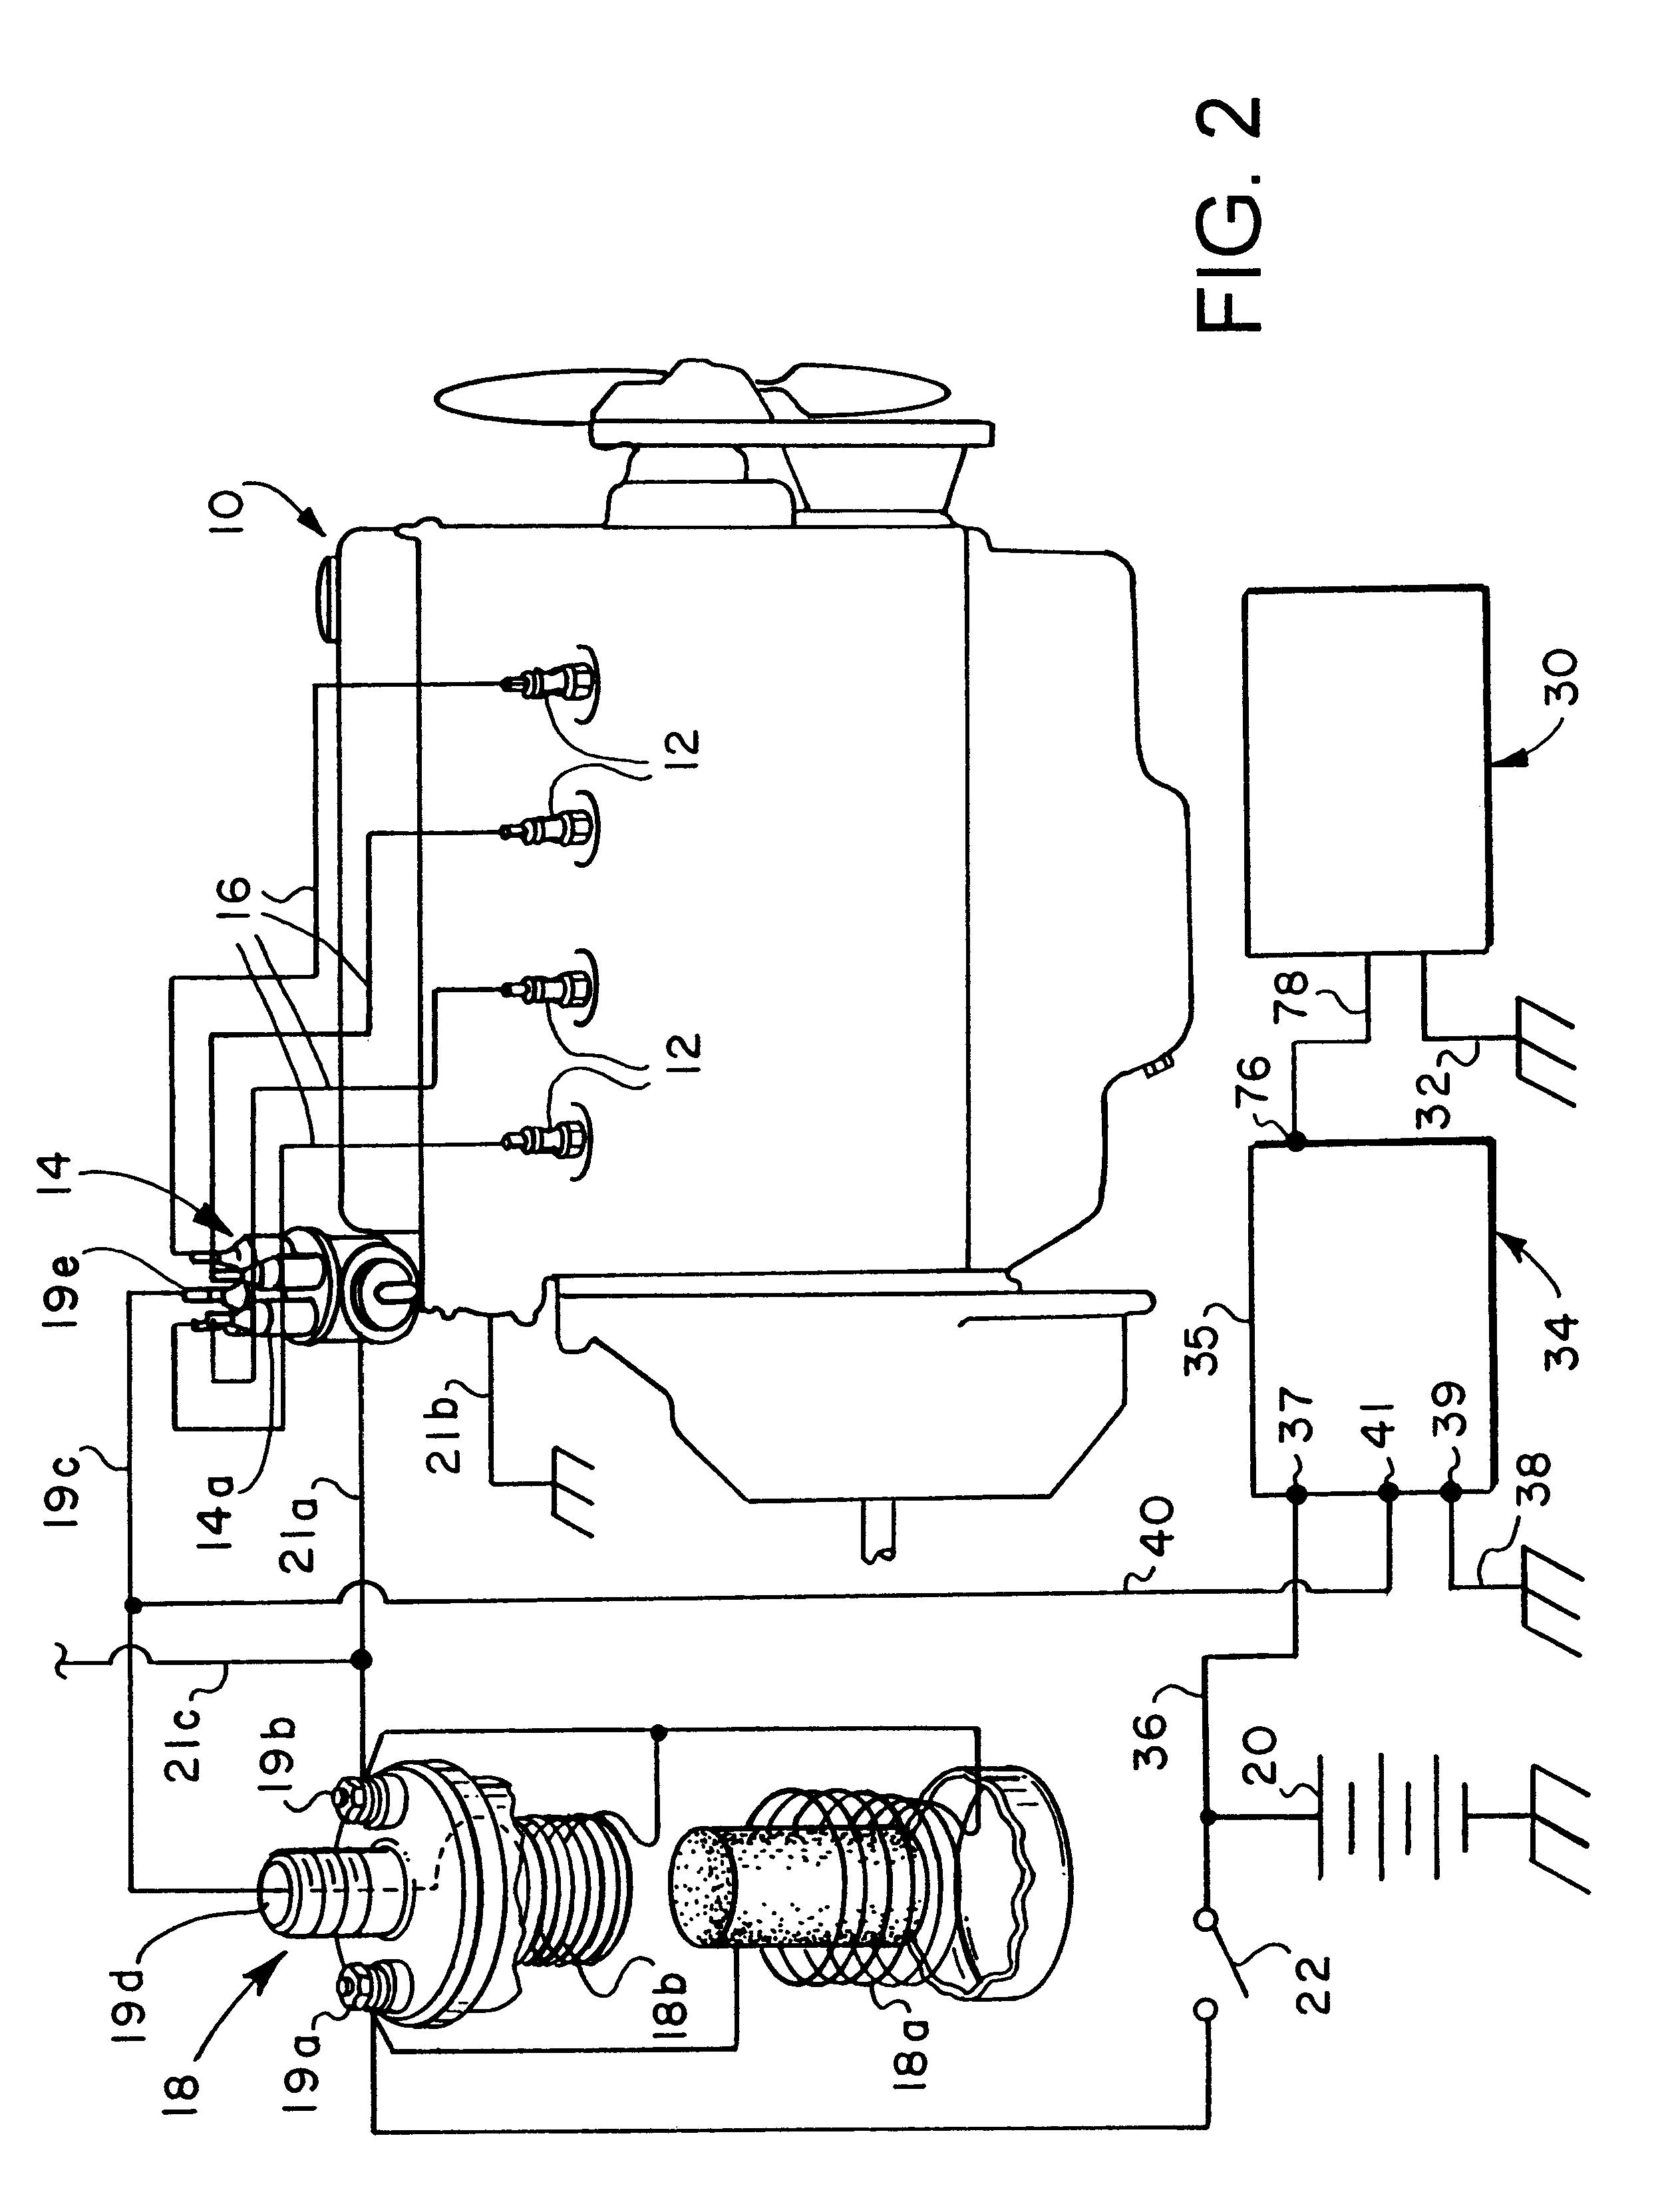 Gm Pulse Generator Wiring Diagram Diagram Auto Wiring